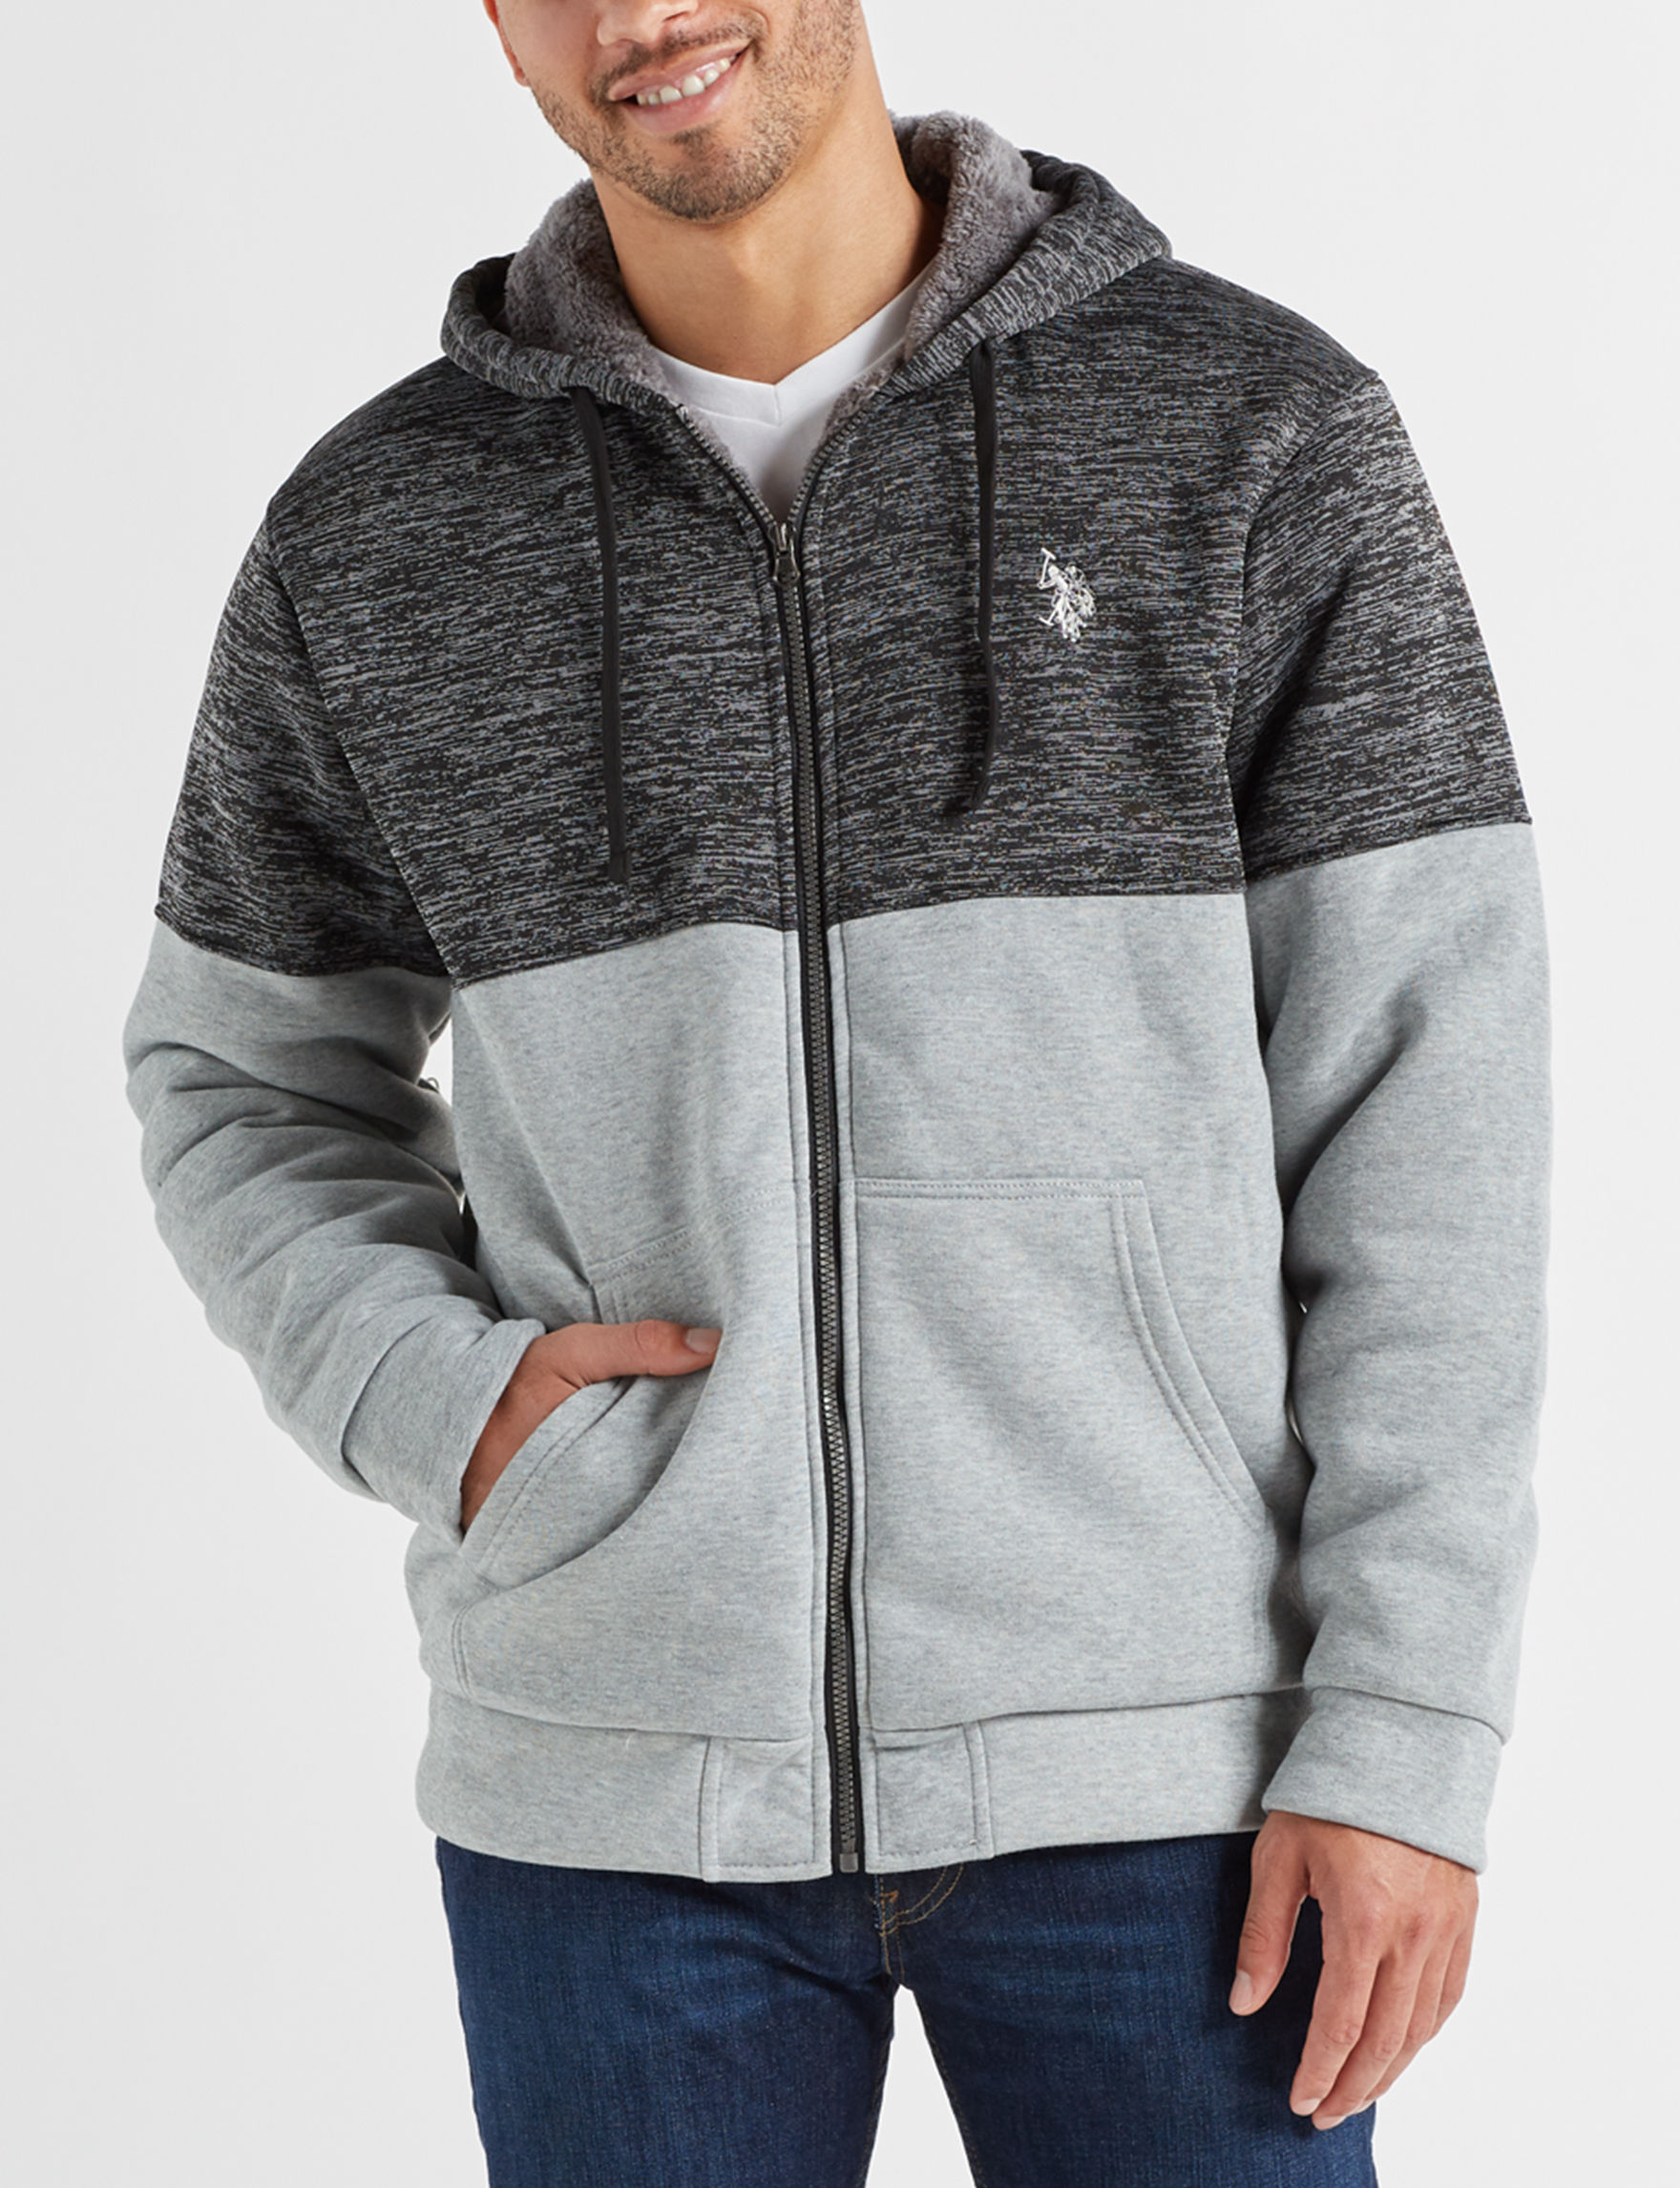 U.S. Polo Assn. Grey Fleece & Soft Shell Jackets